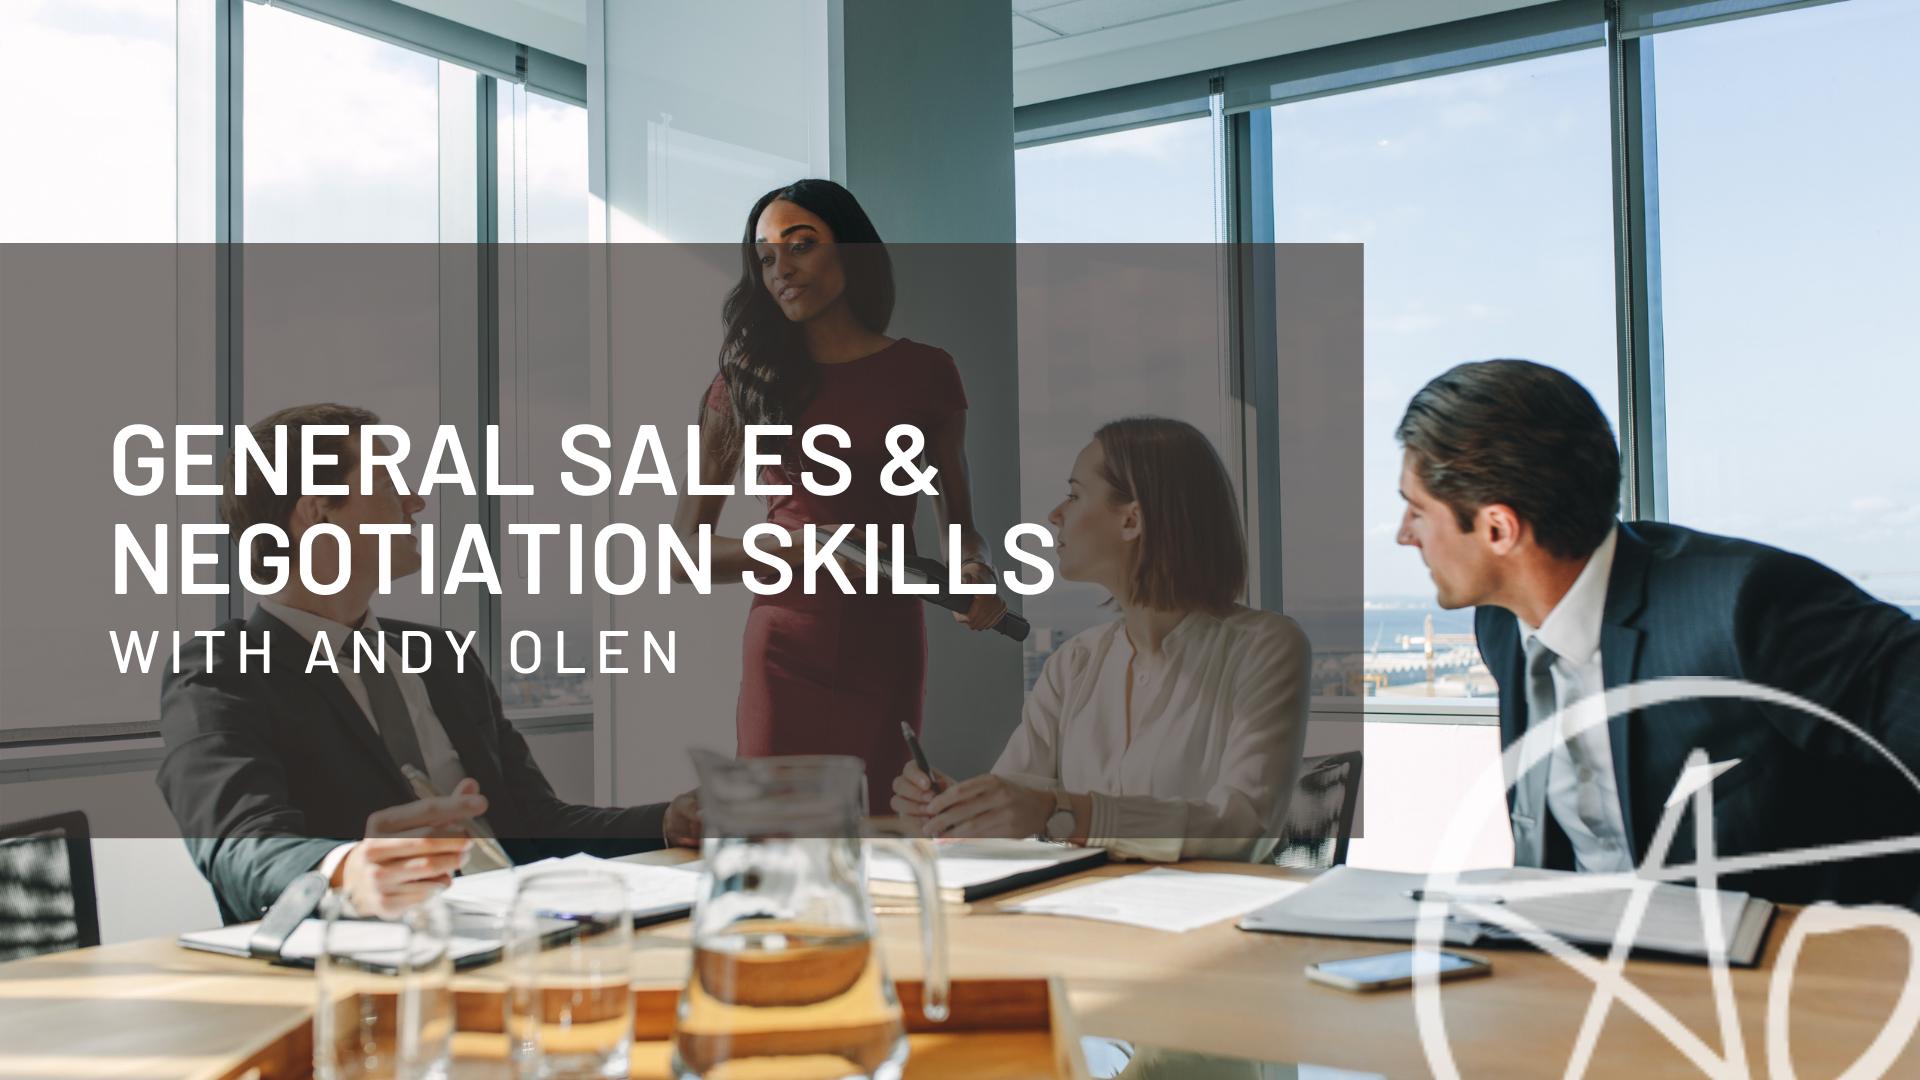 General Sales & Negotiation Skills